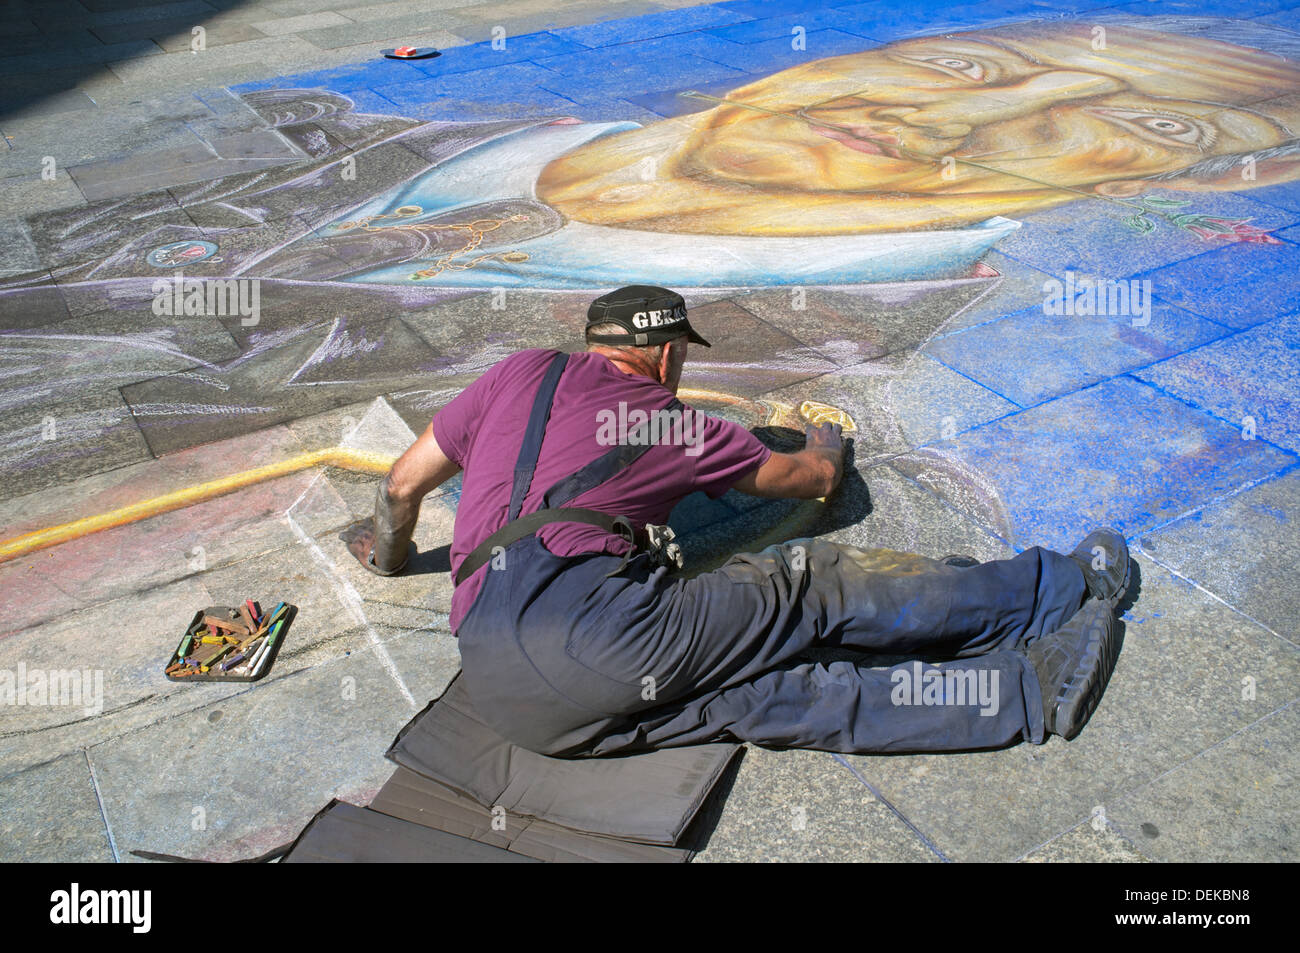 Künstler Köln streetart künstler köln stockfoto bild 60662596 alamy